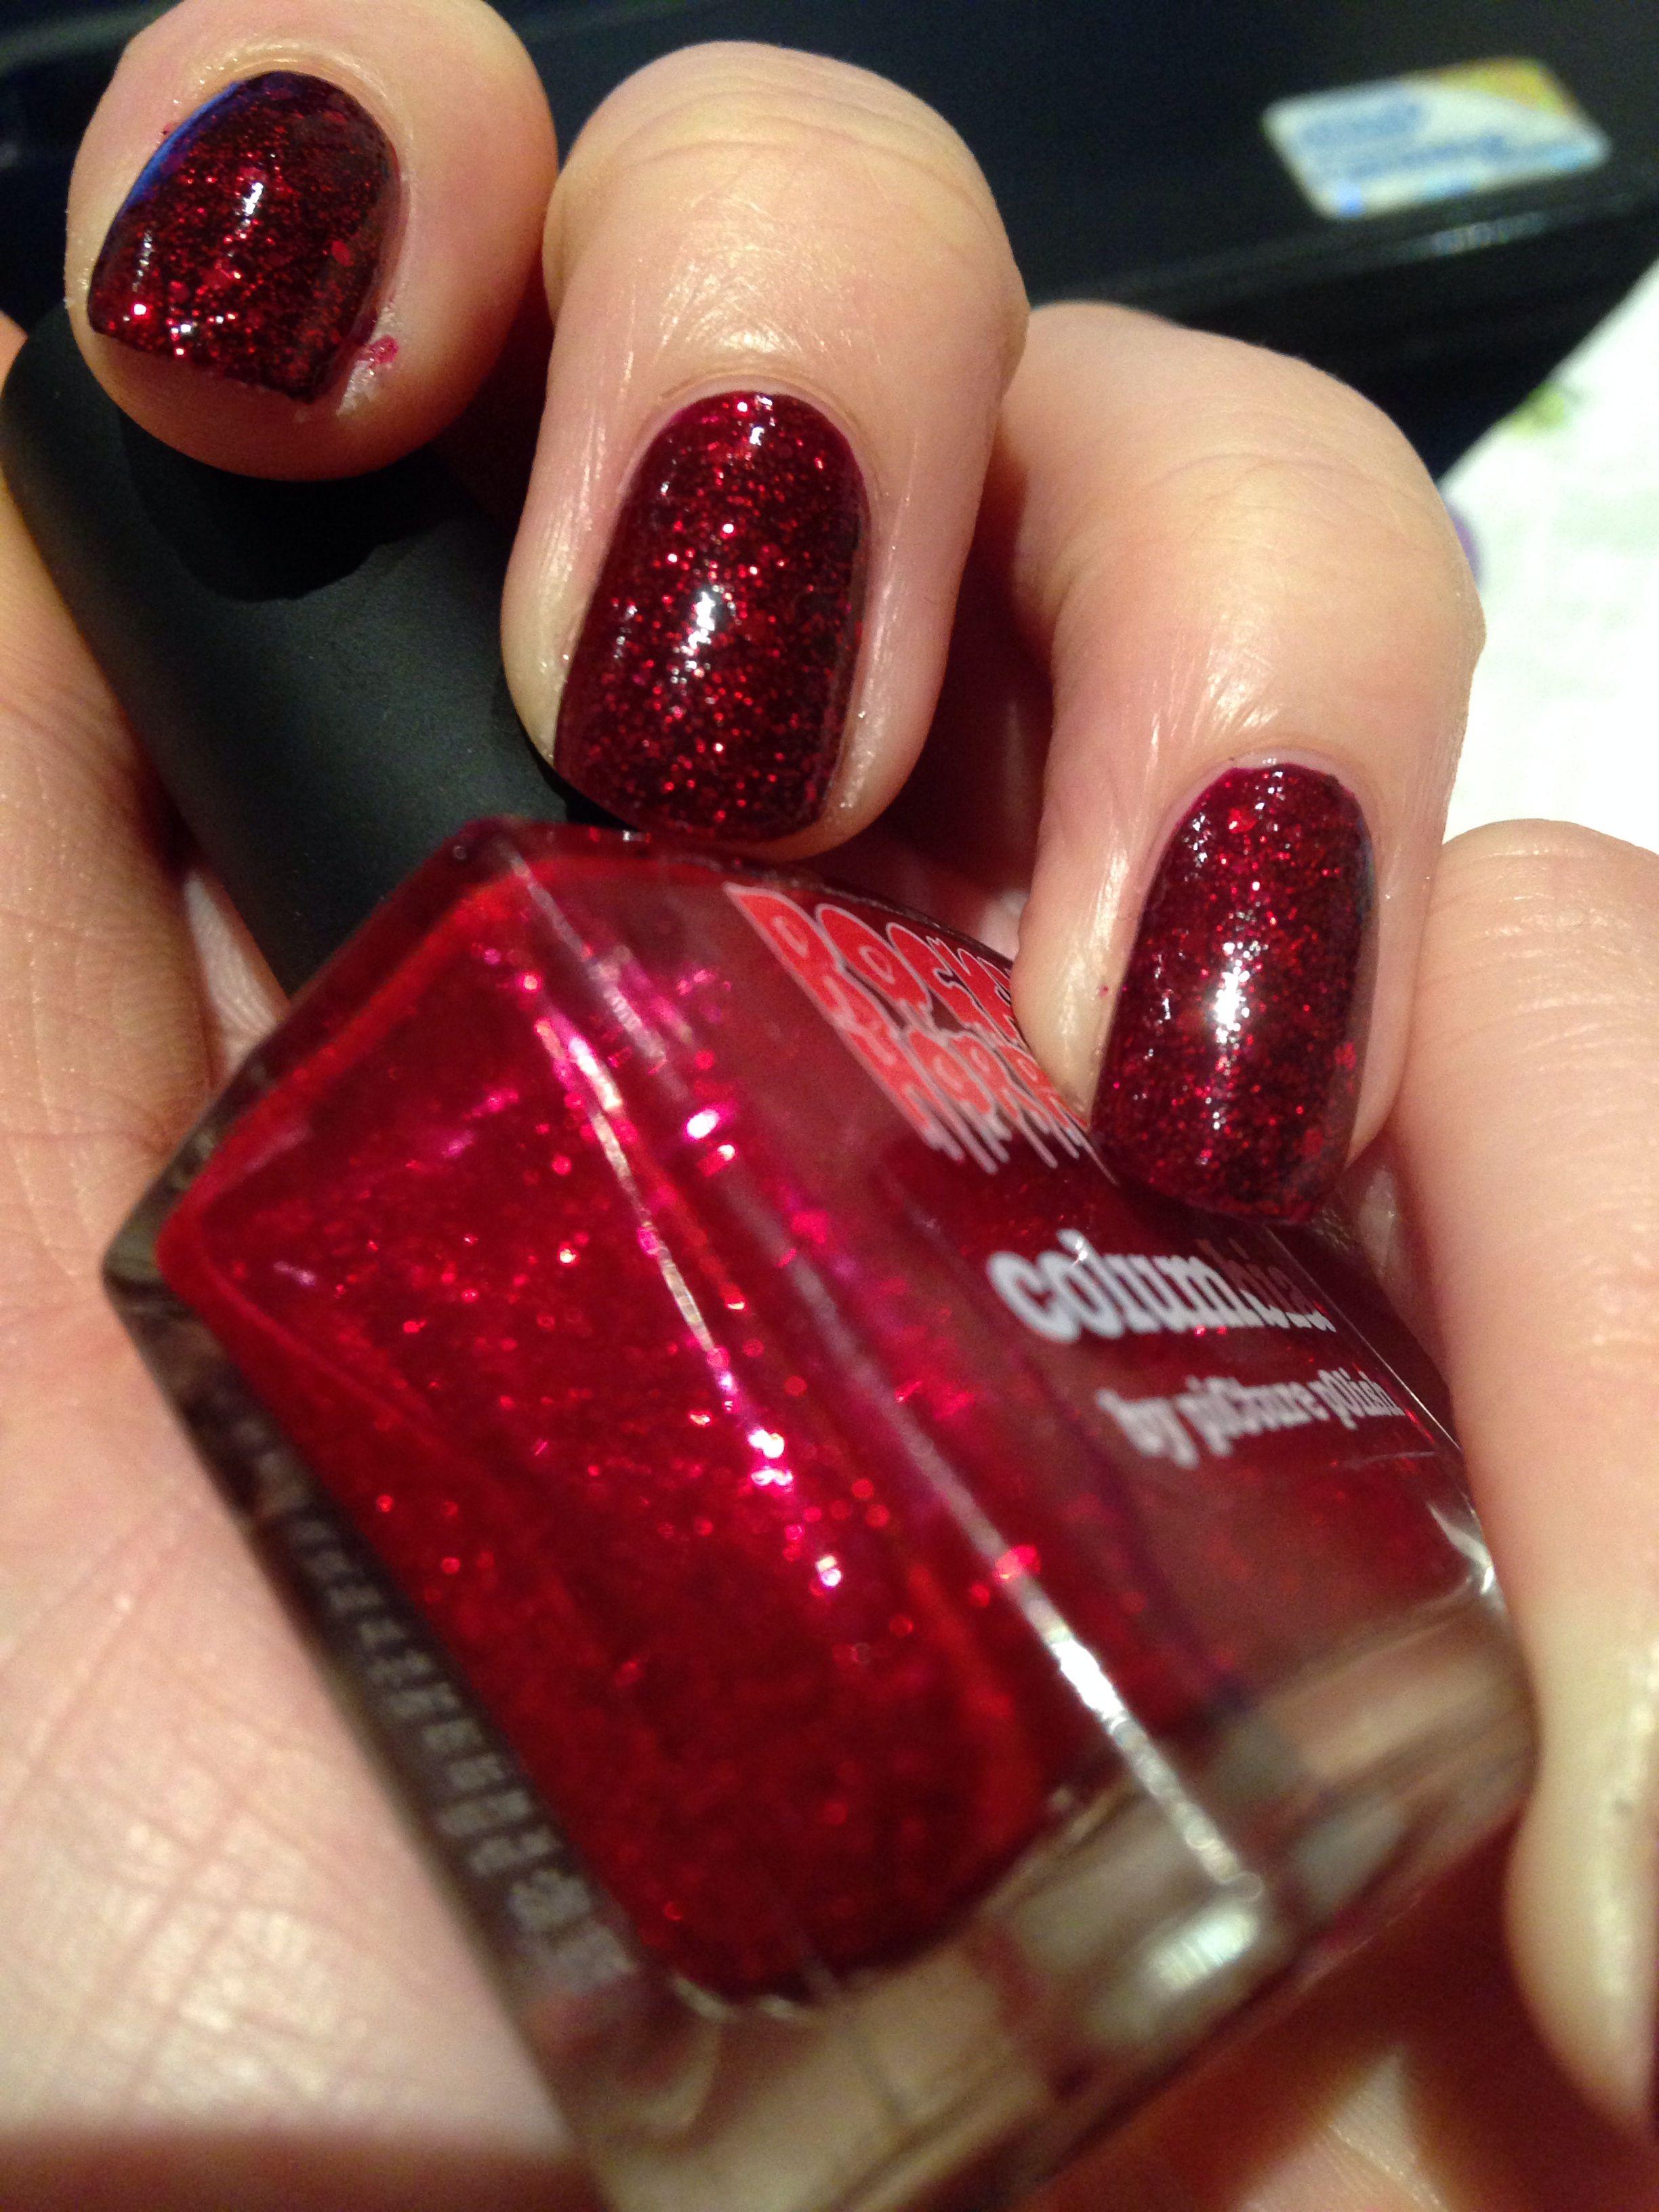 Nails inc Victoria + picture polish Columbia